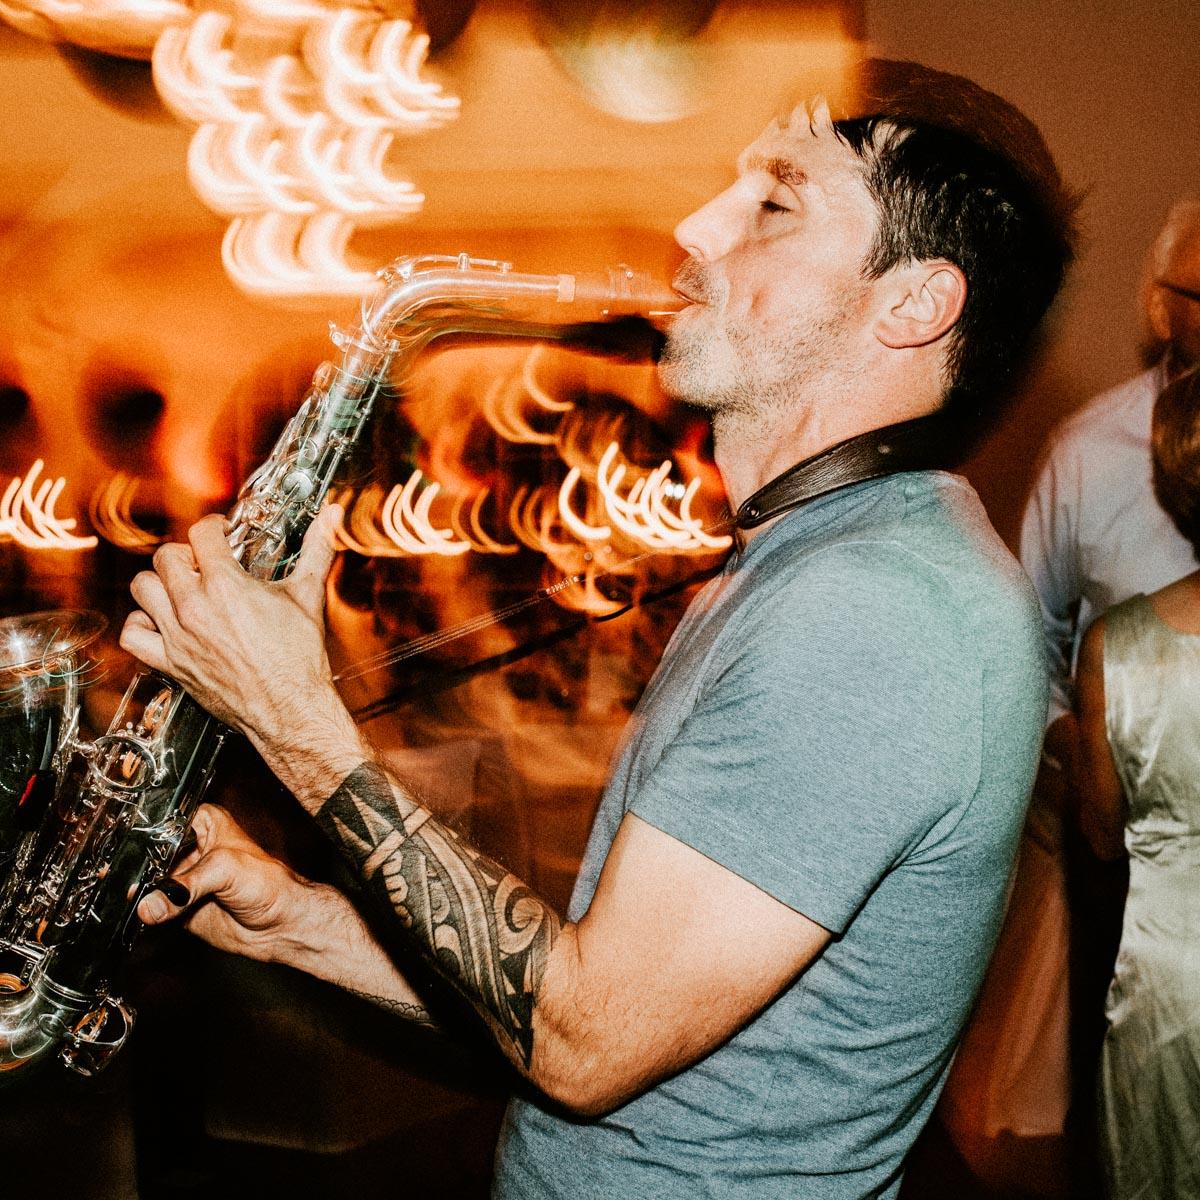 Saxophonist |Saxophonspieler |Christopher |House |Techno |Electro |DJ |Combo |Party |Highlighte |Buchen |Mieten |Anfragen |Lehmann |Eventservice